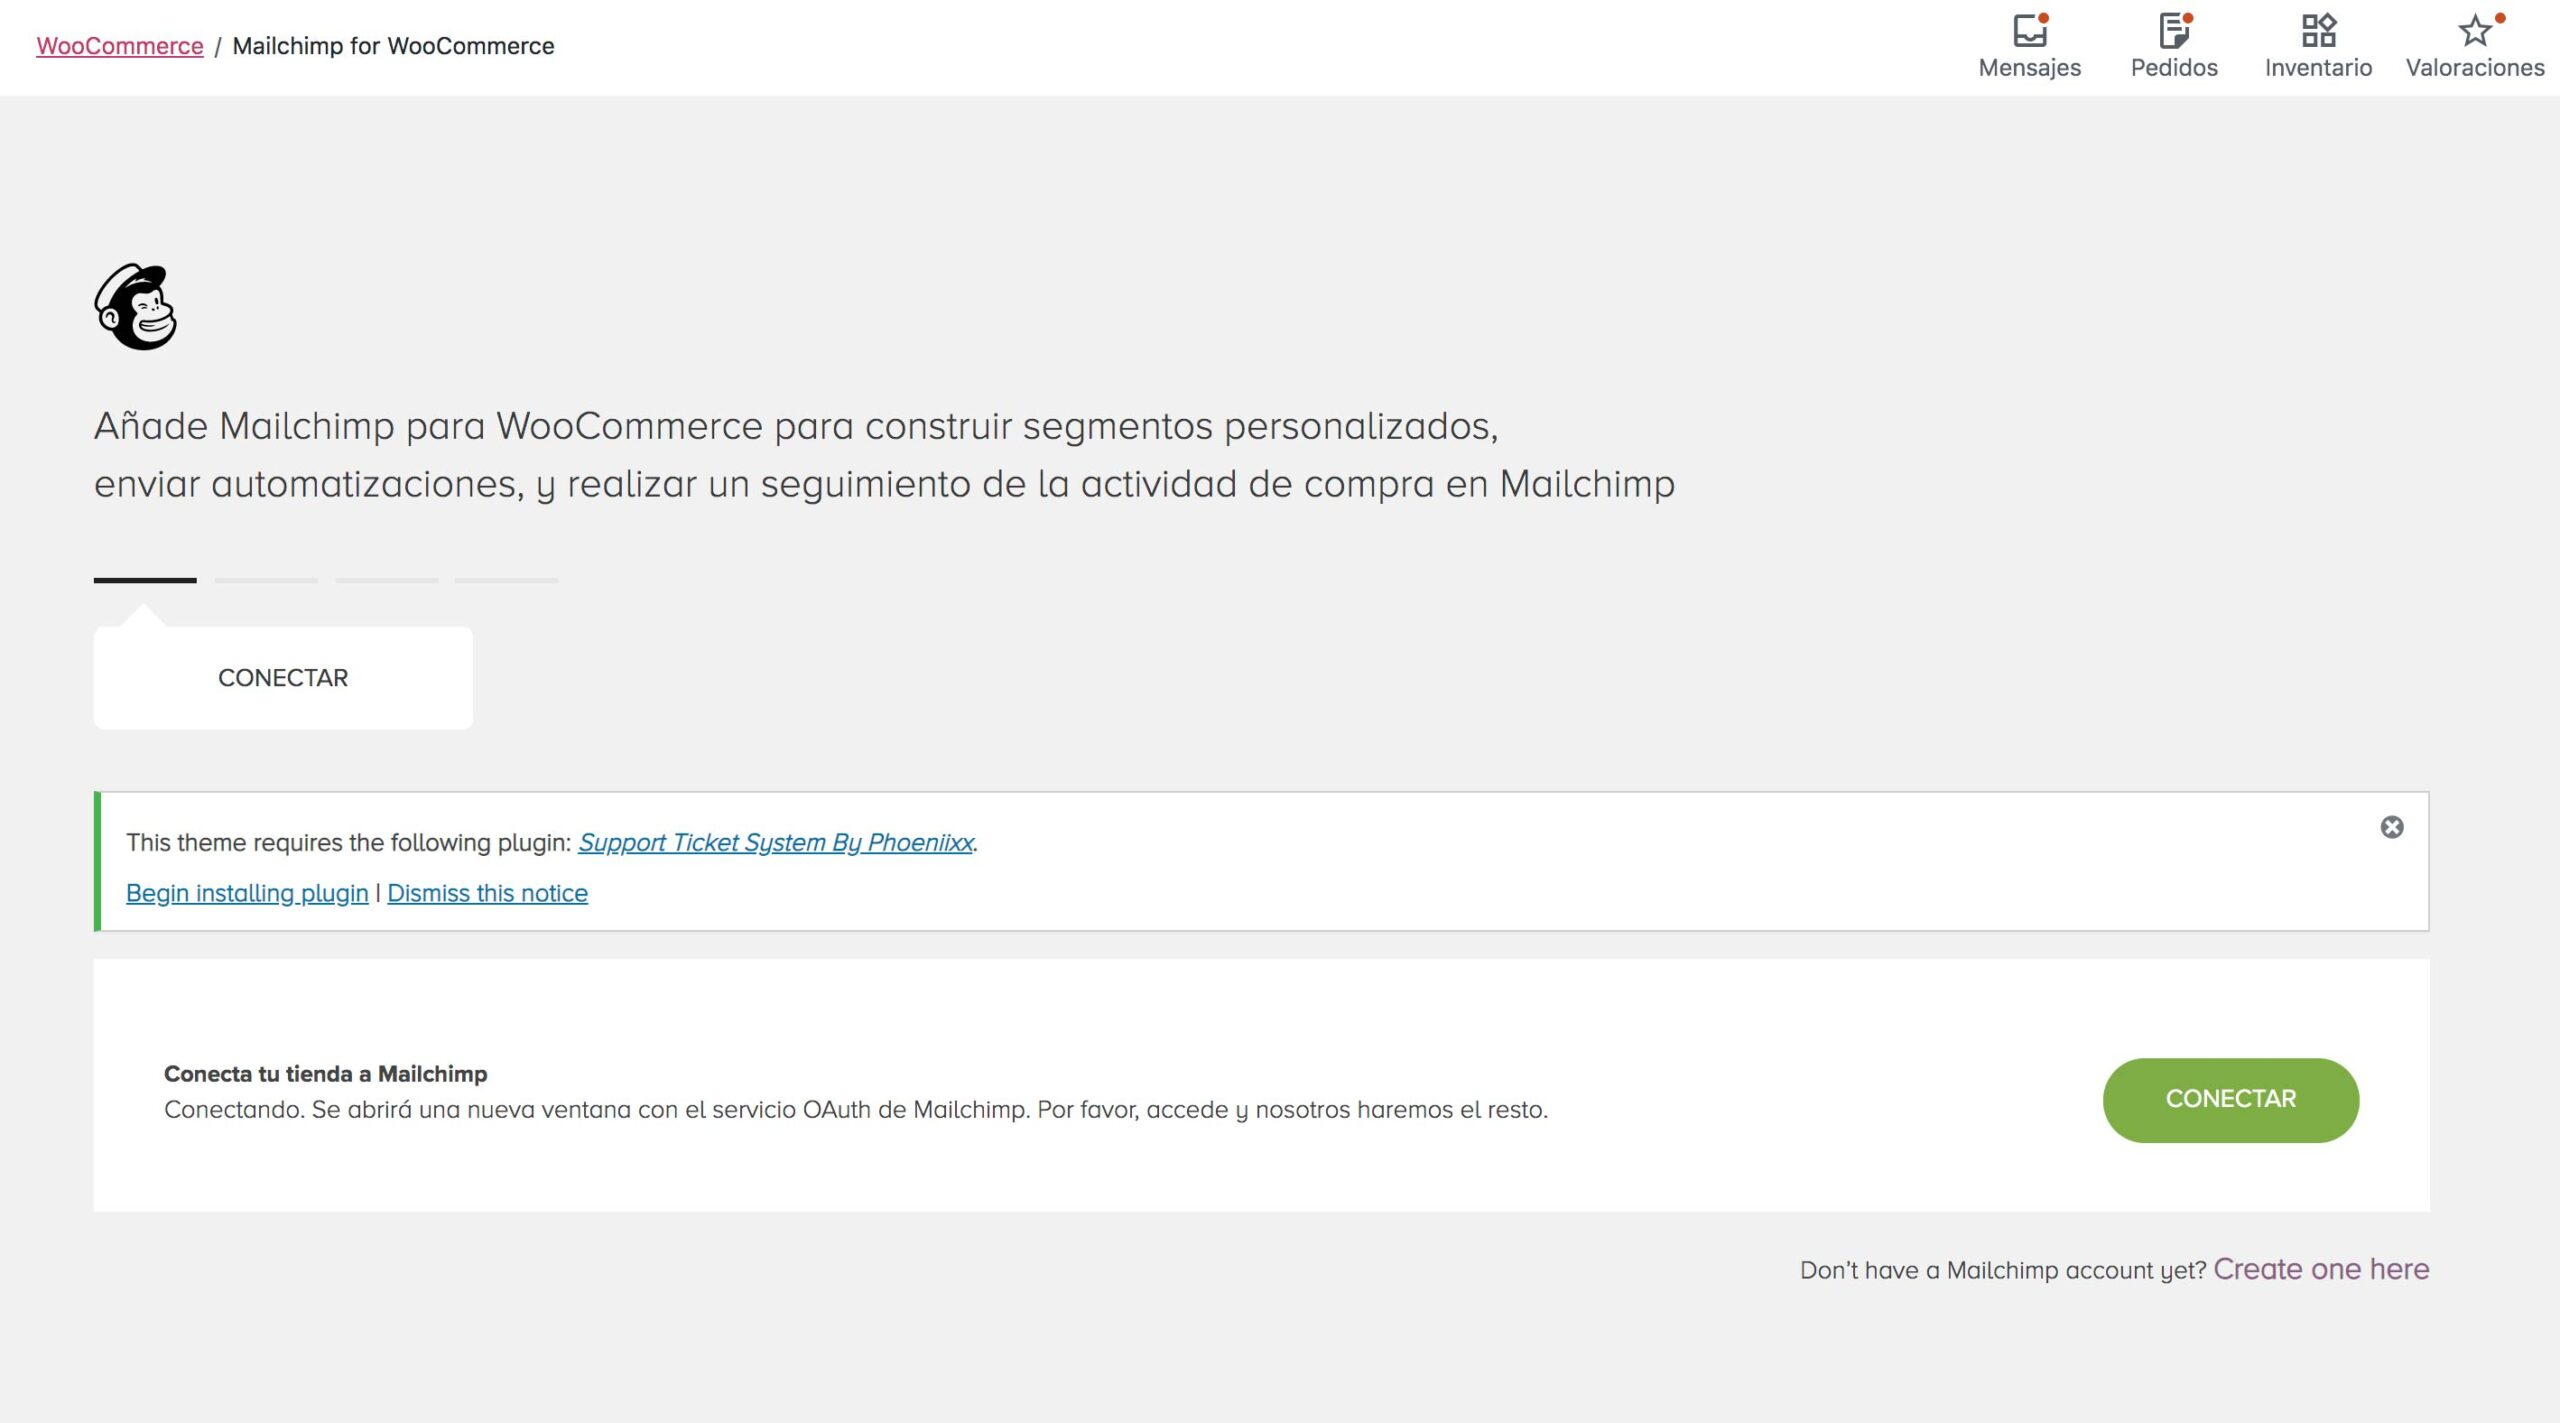 Mailchimp para woocomerce tiendas online sincronizacion